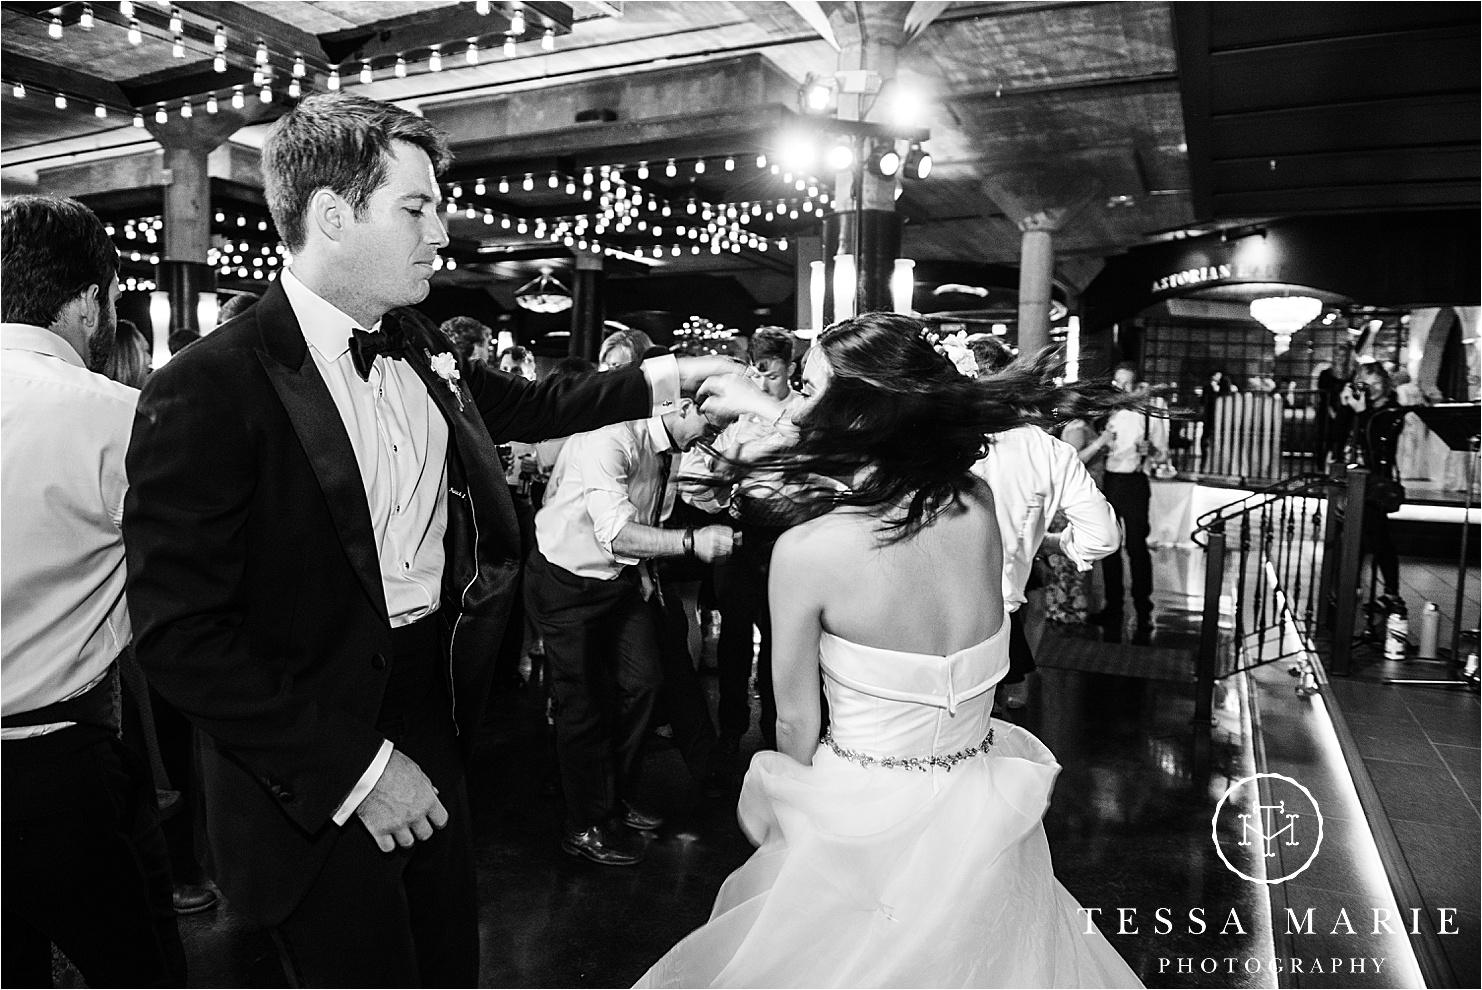 Tessa_marie_weddings_houston_wedding_photographer_The_astorian_0183.jpg